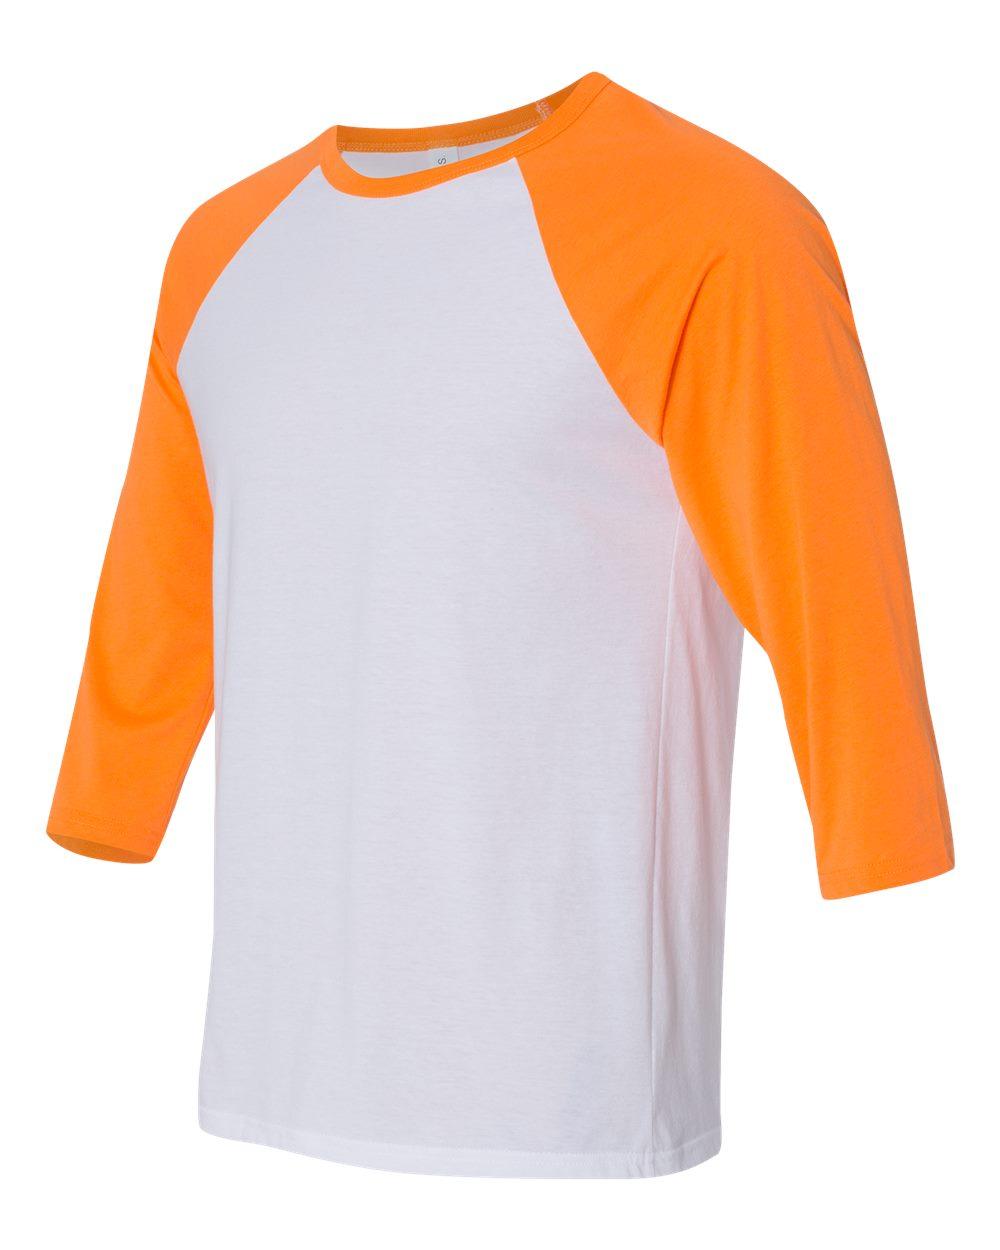 click to view White/Neon Orange